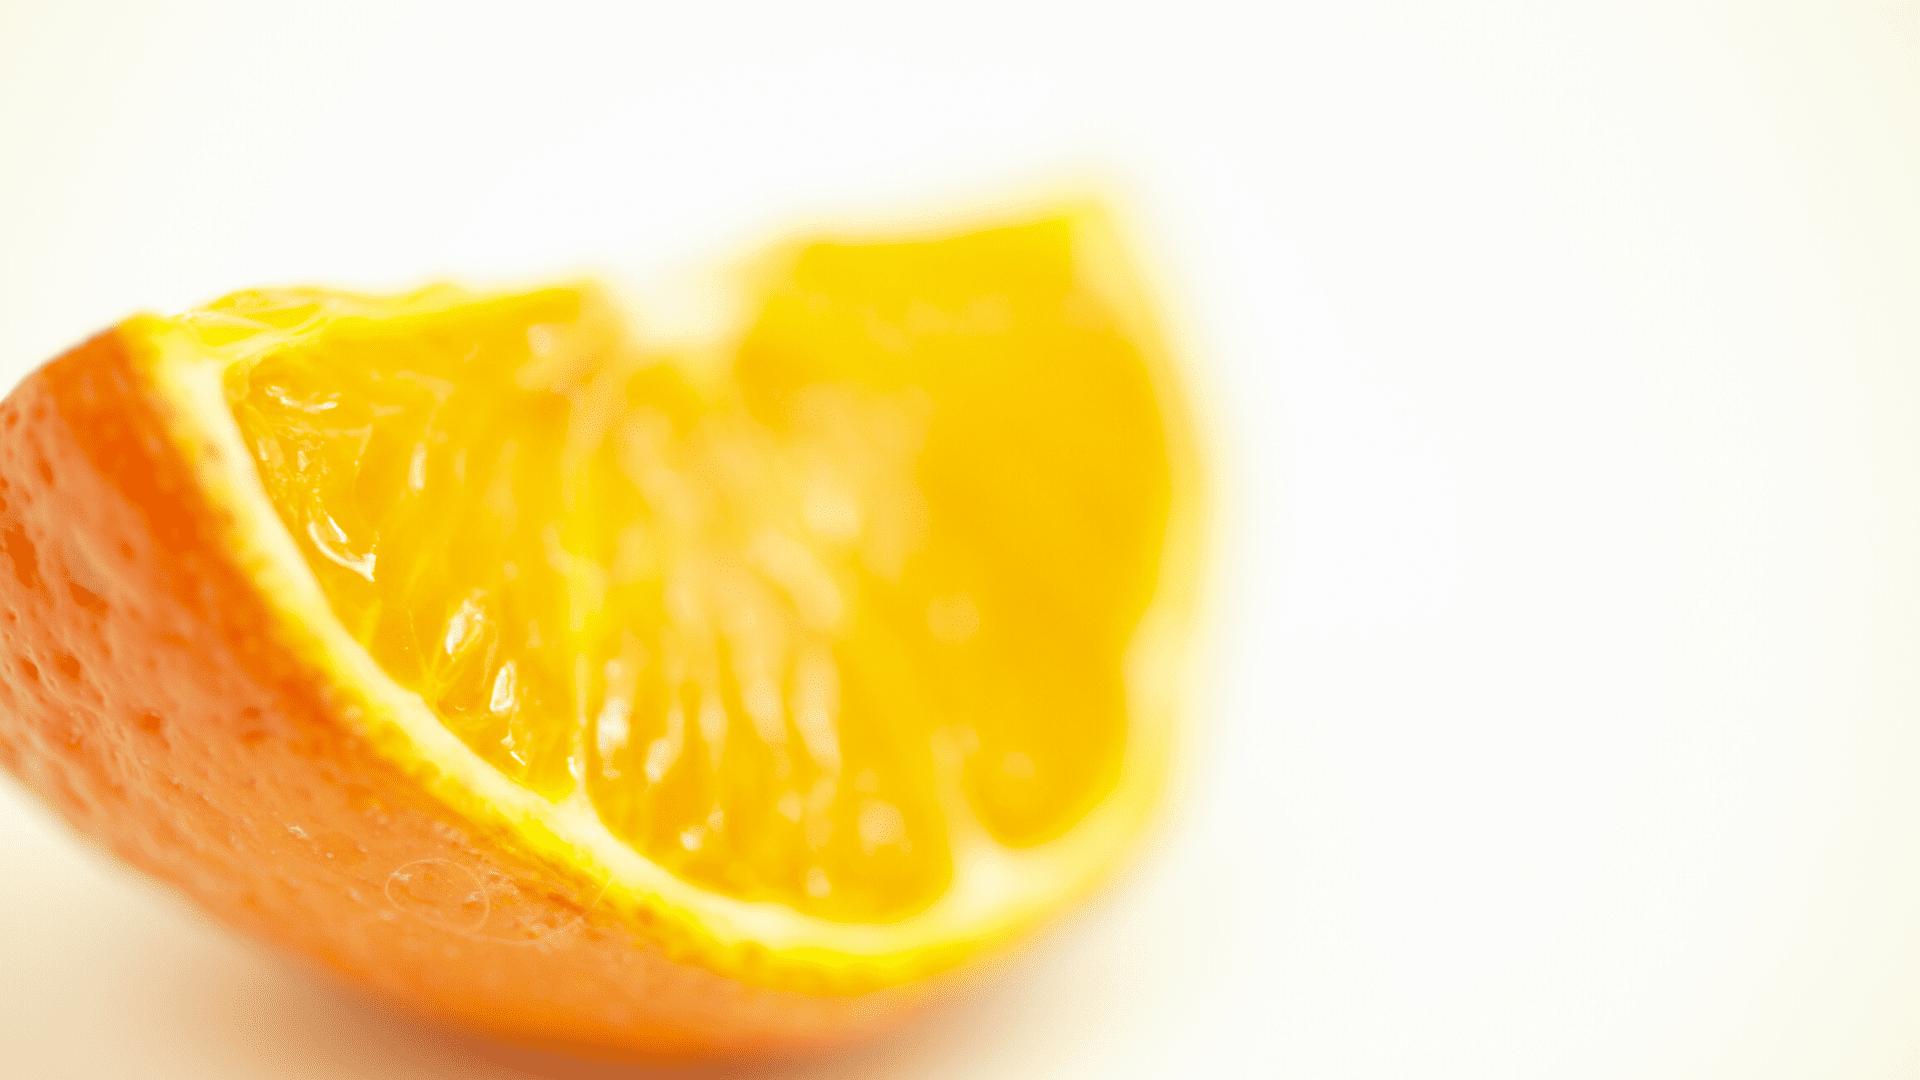 Orange Slice macro